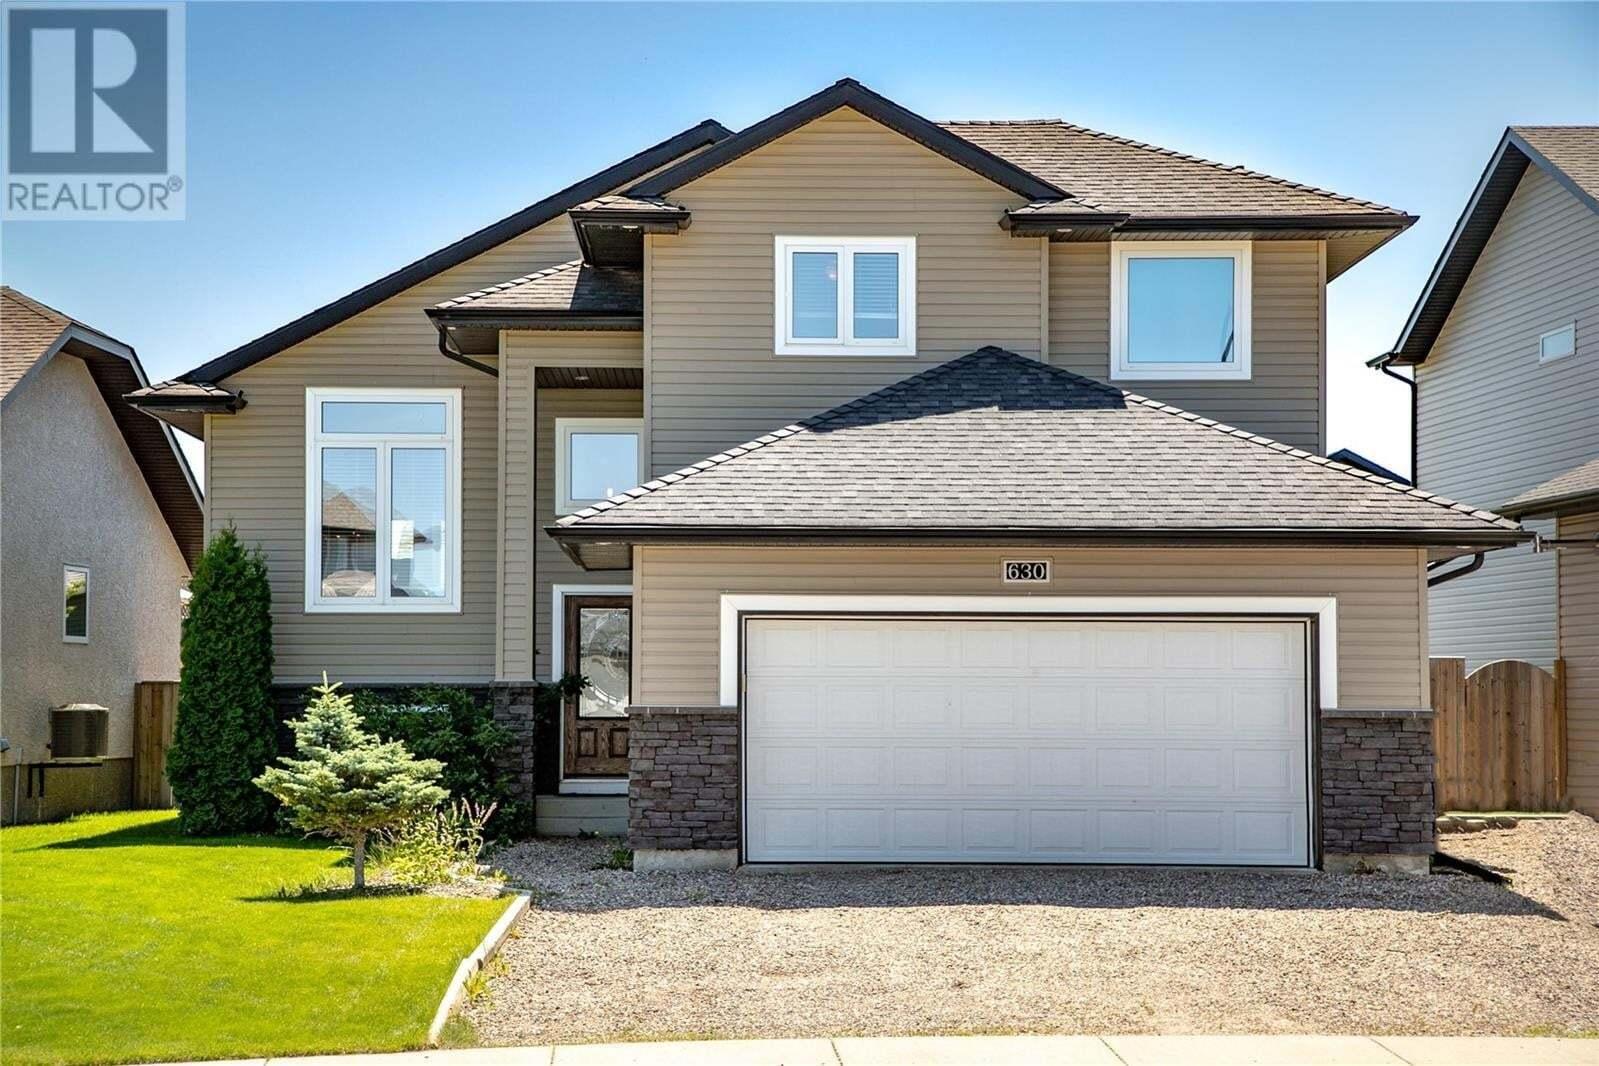 House for sale at 630 Hargreaves Ln Saskatoon Saskatchewan - MLS: SK815272